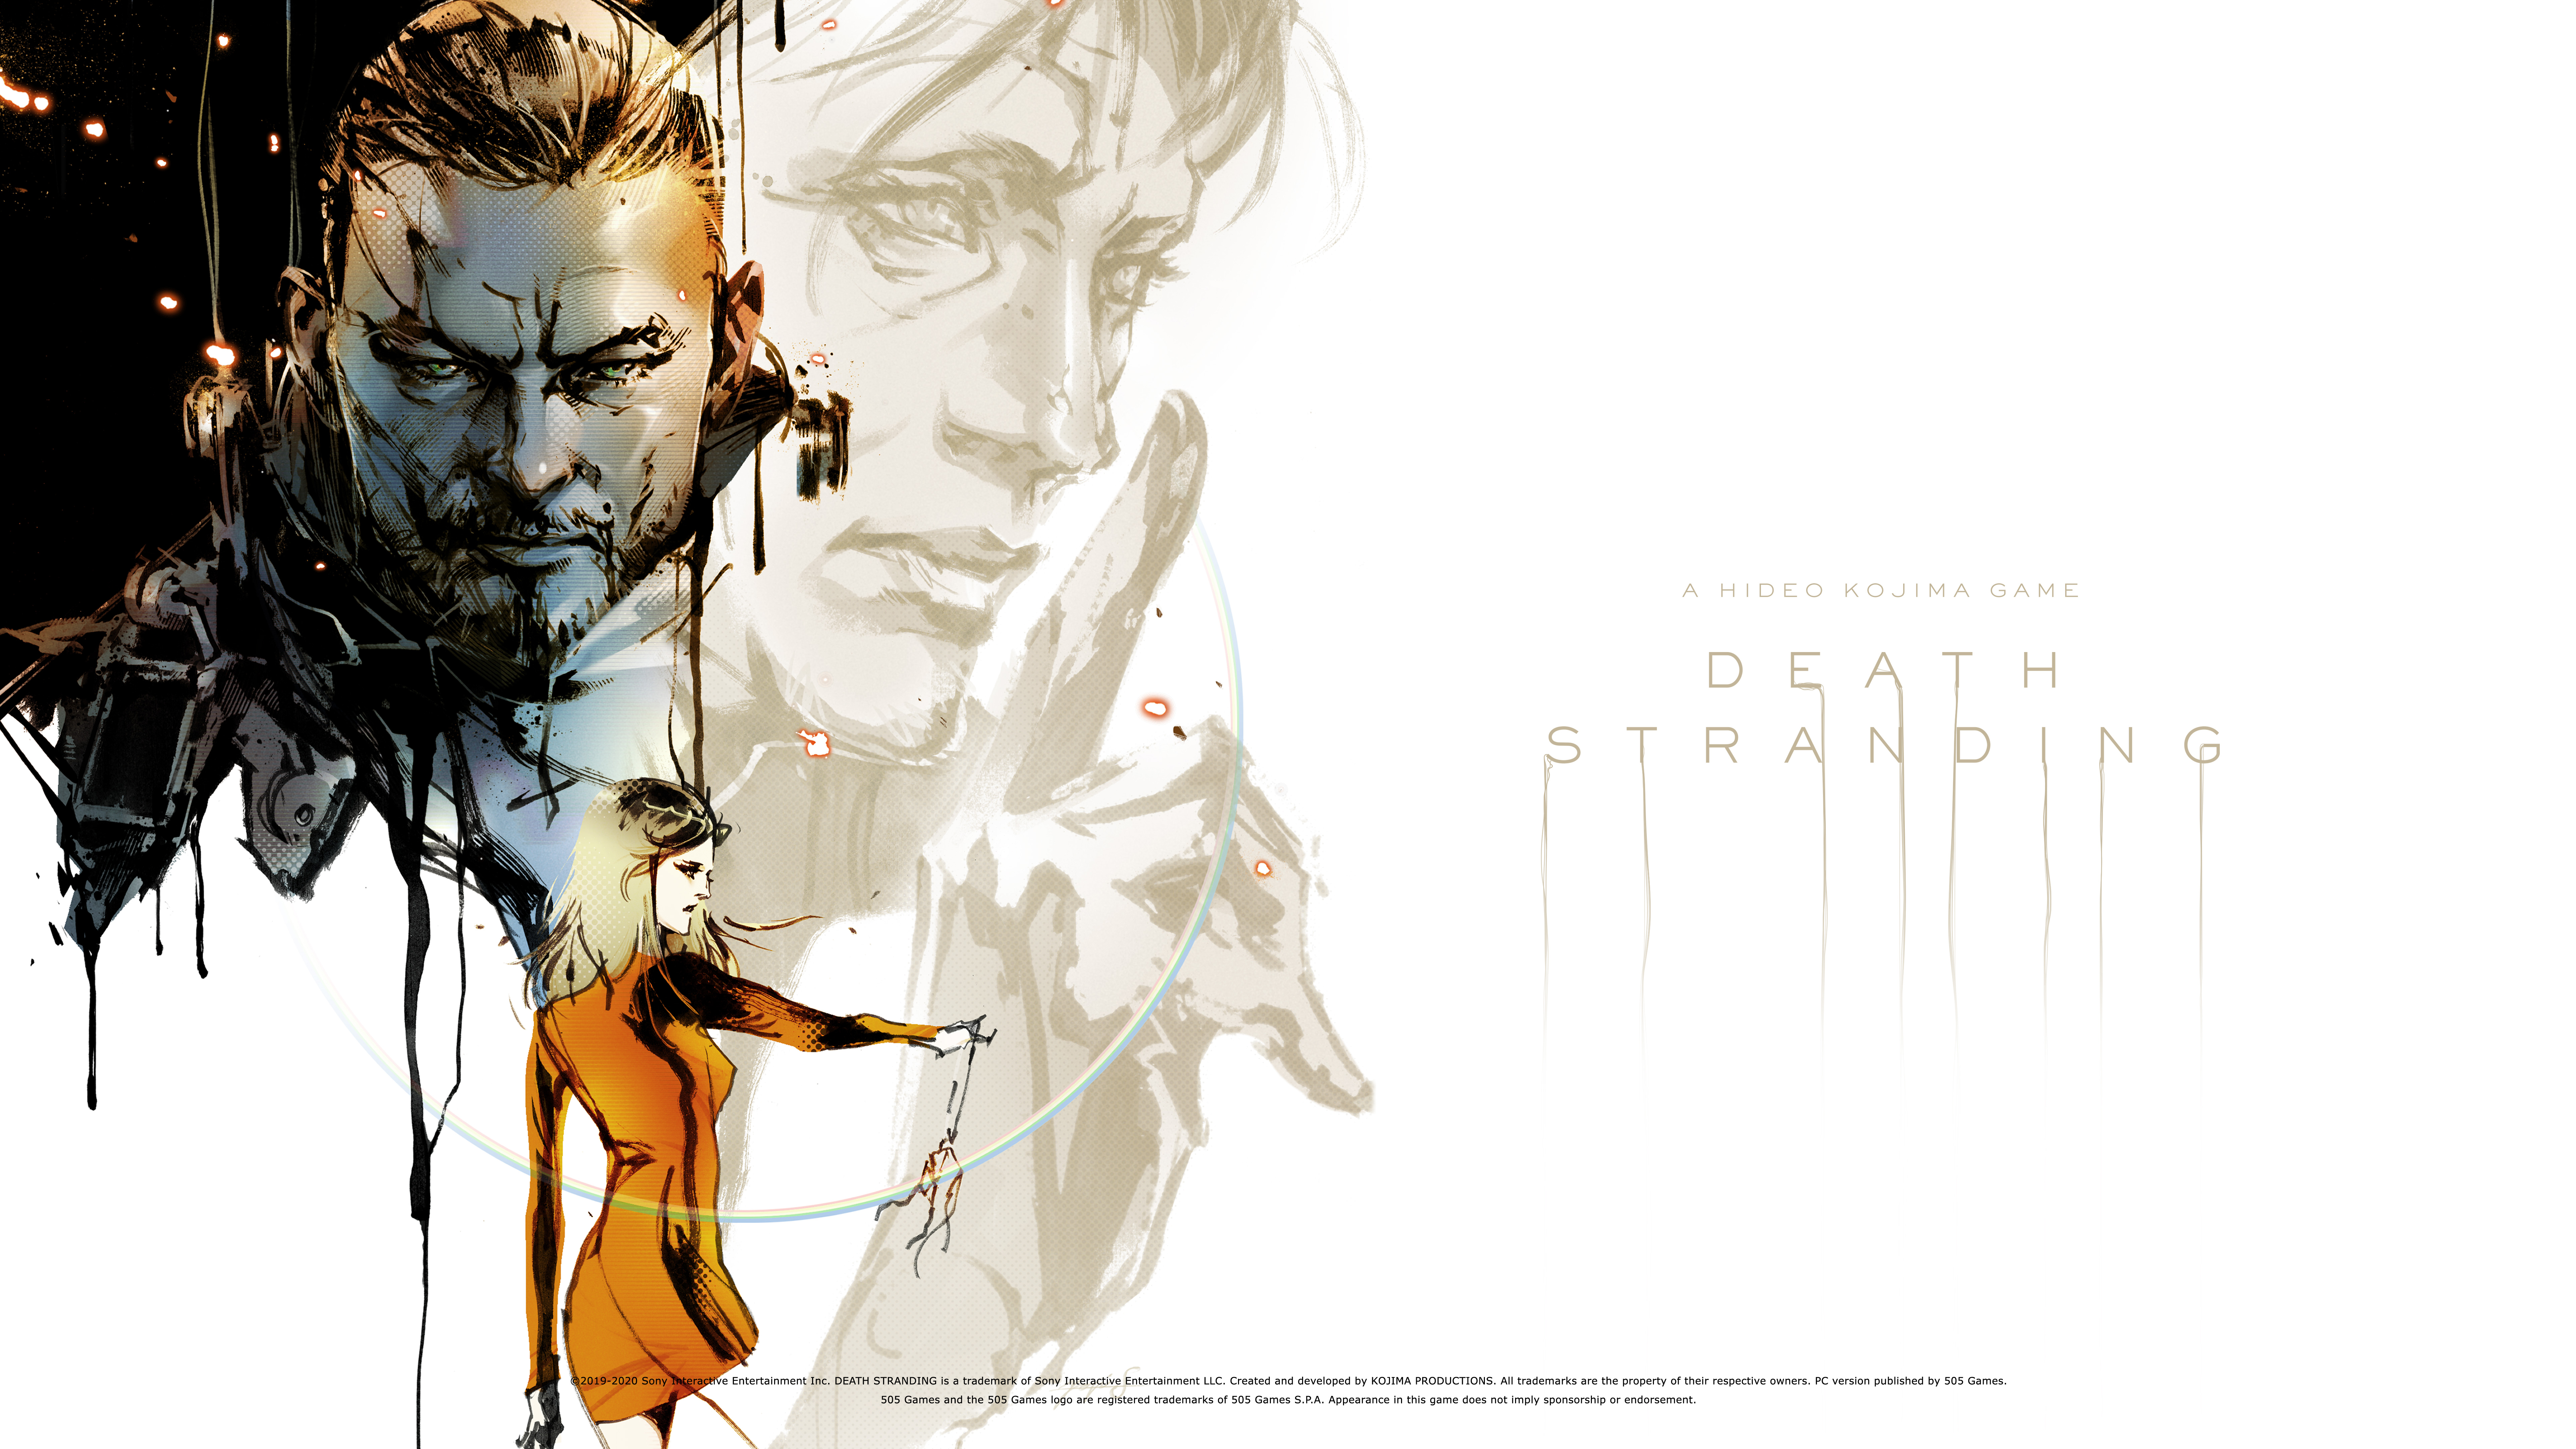 General 7680x4320 Death Stranding Hideo Kojima concept art video games video game art